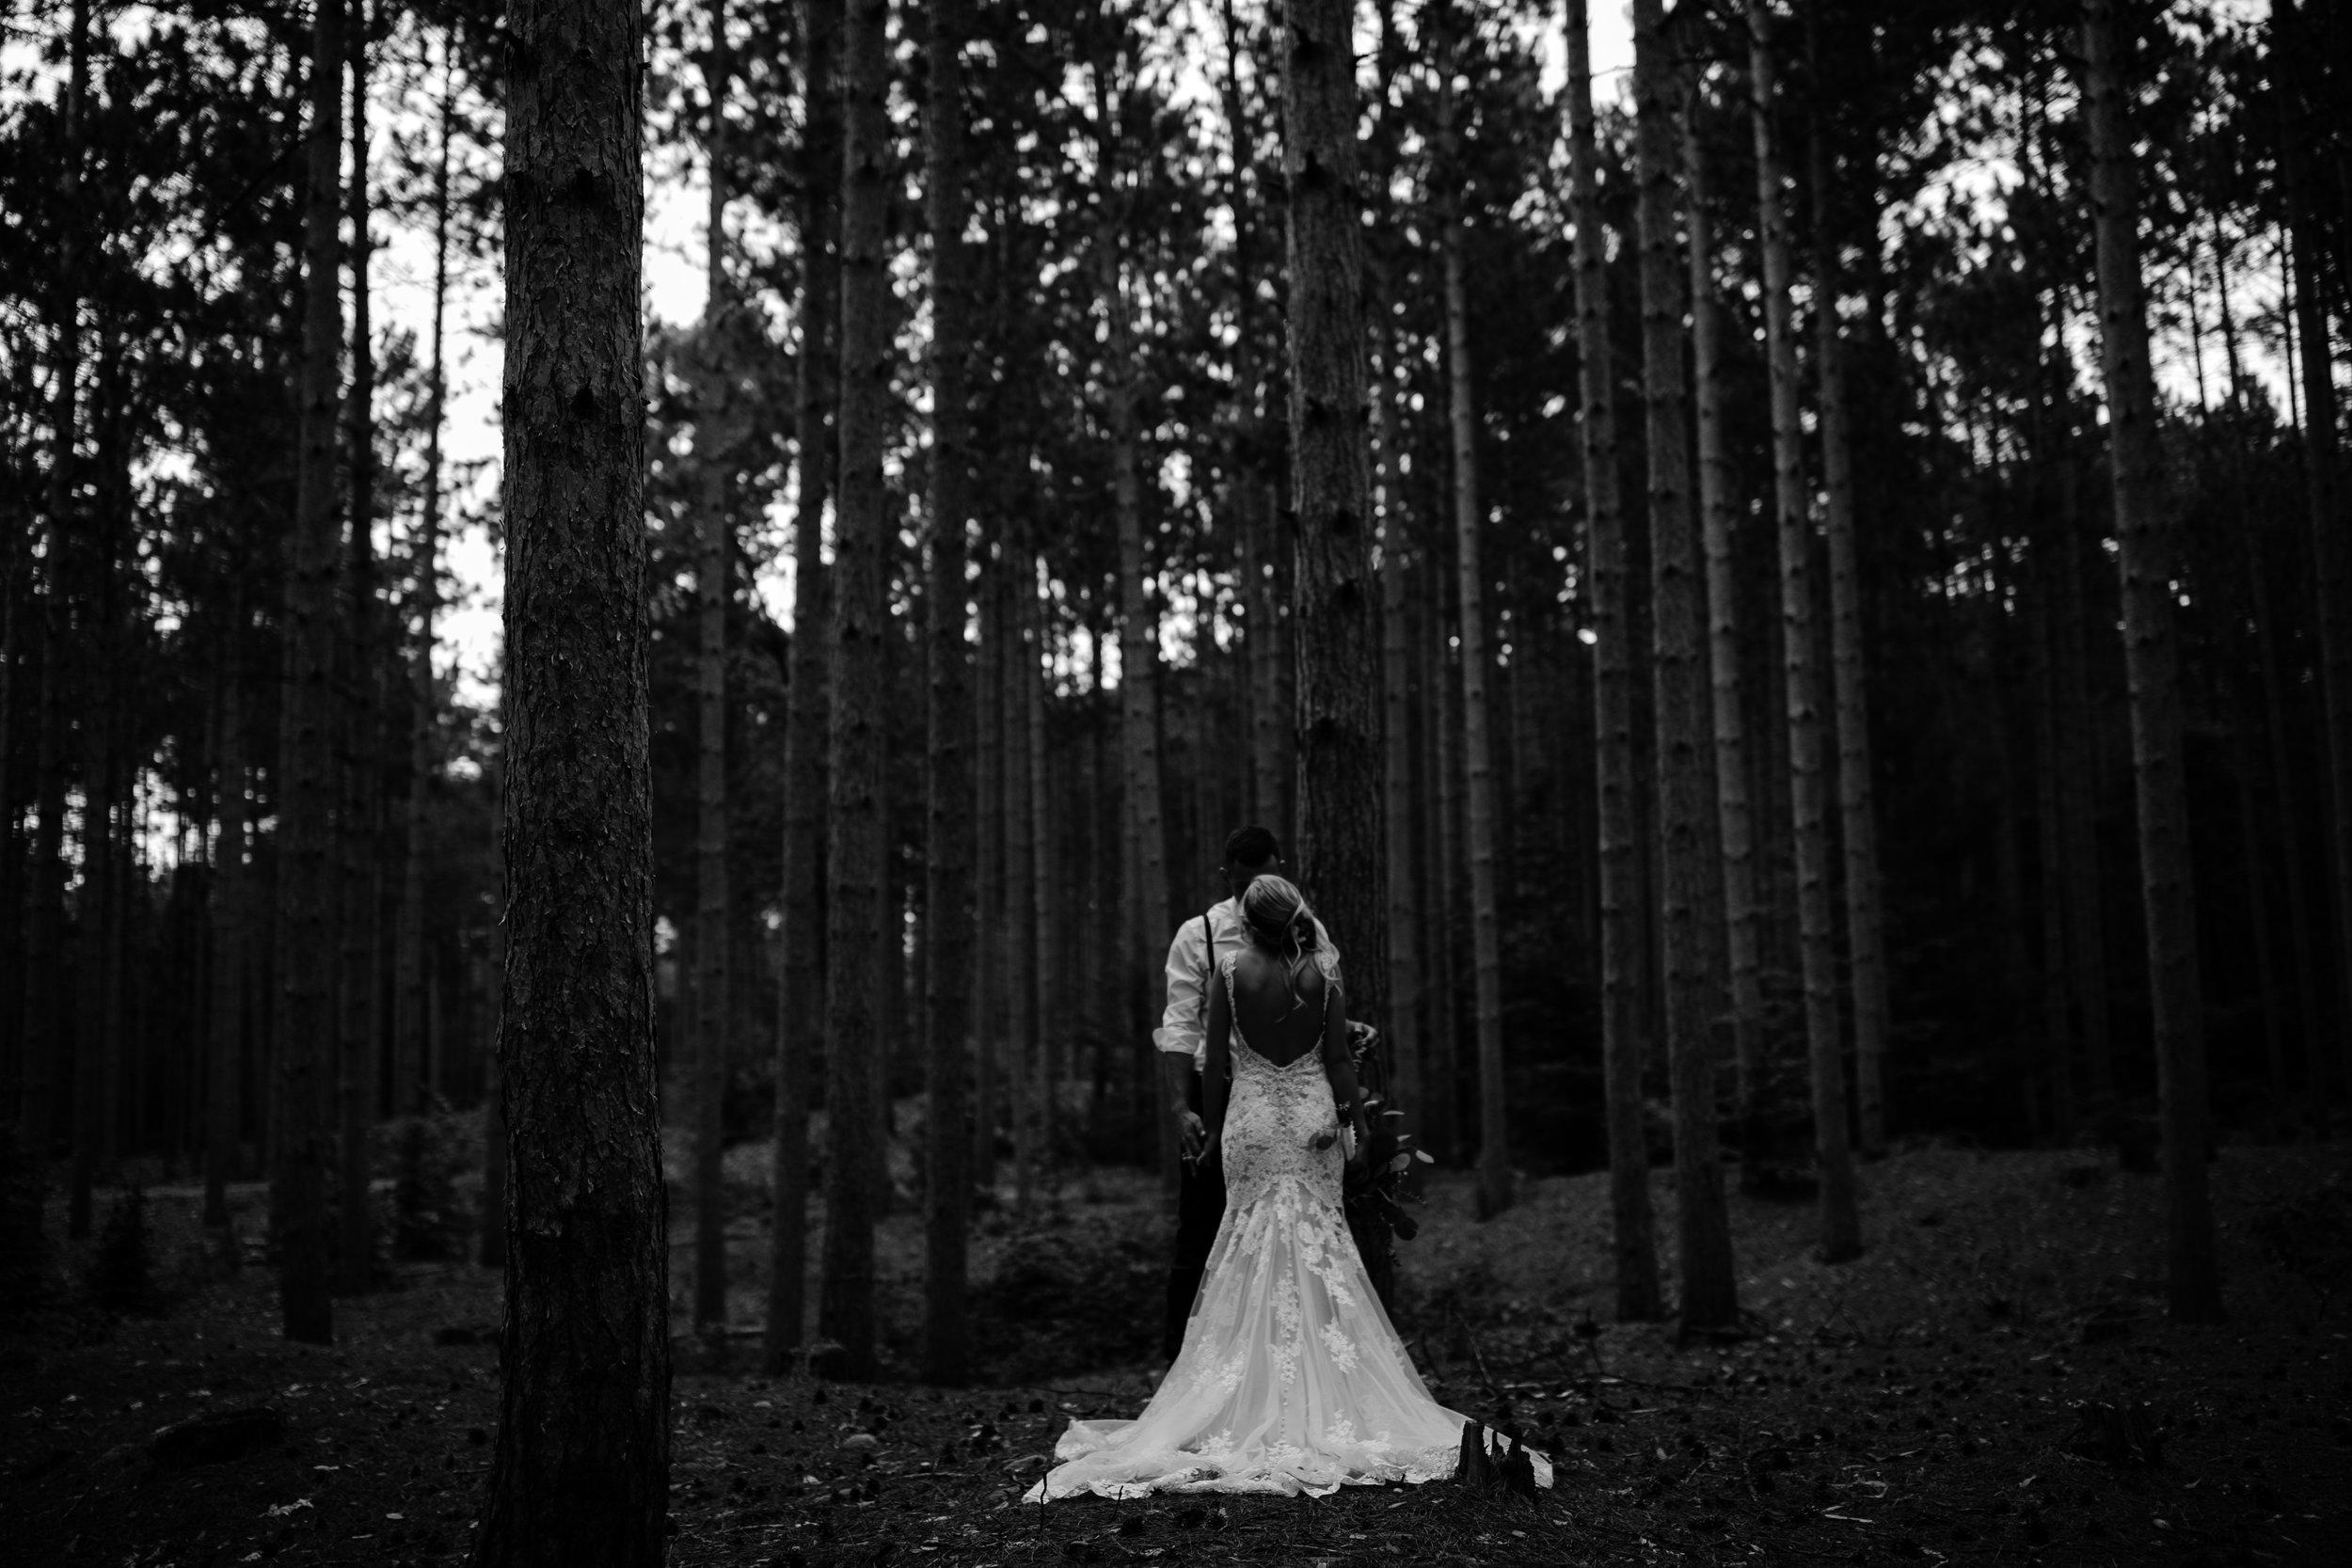 west-michigan-wedding-photographer-whitehall-rachel-austin-chapel-in-the-pines-483.jpg